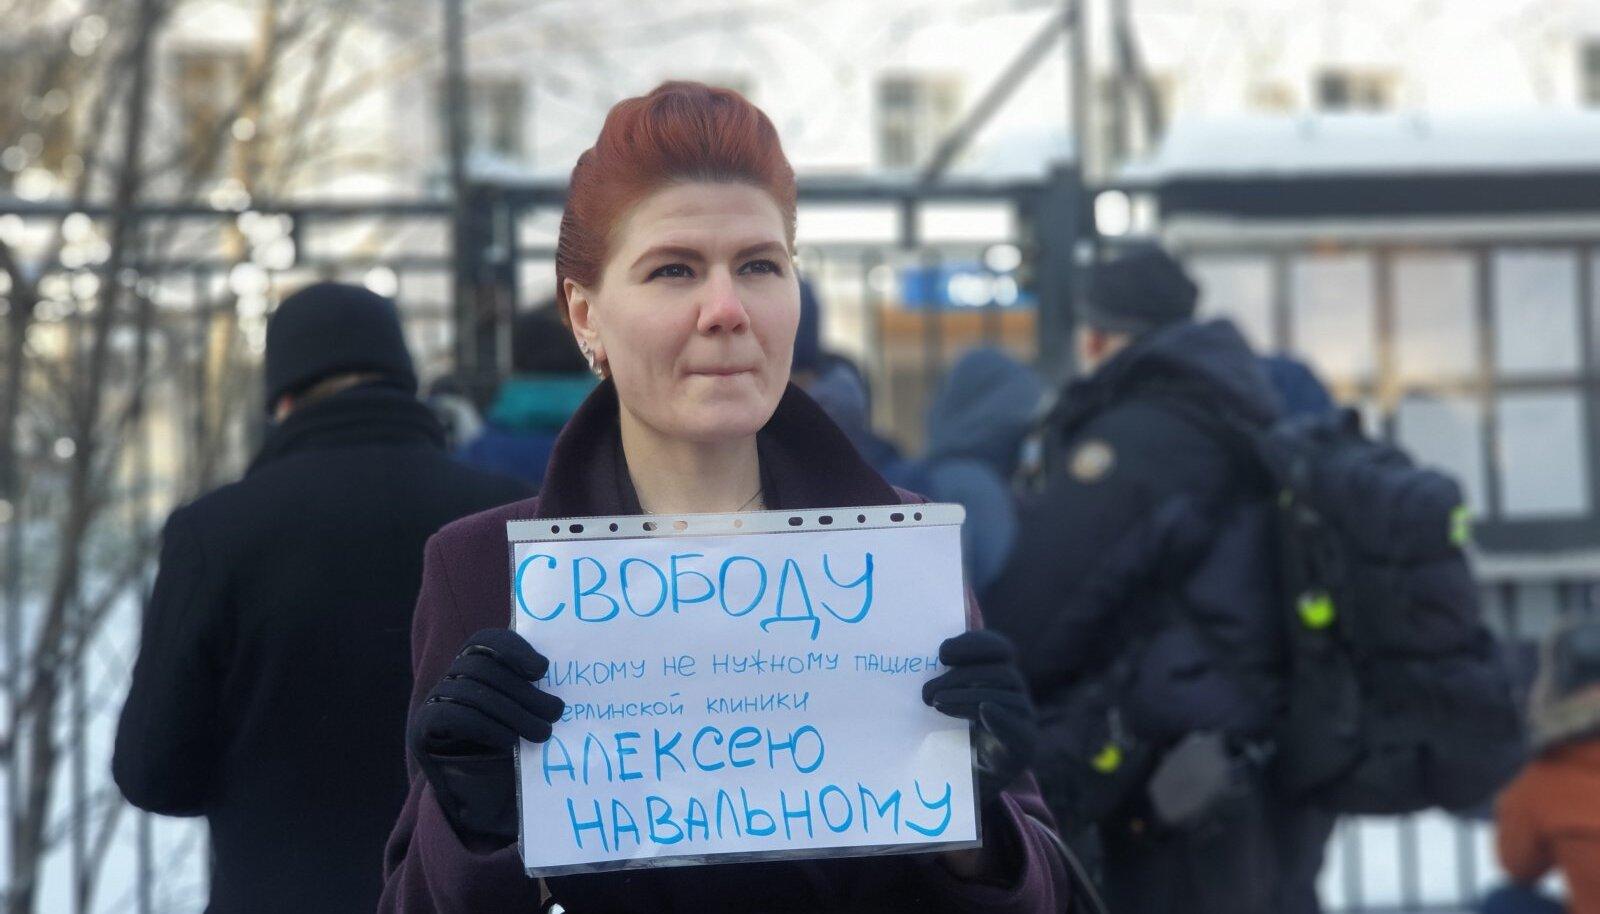 Сторонница Навального у здания ОВД Химки